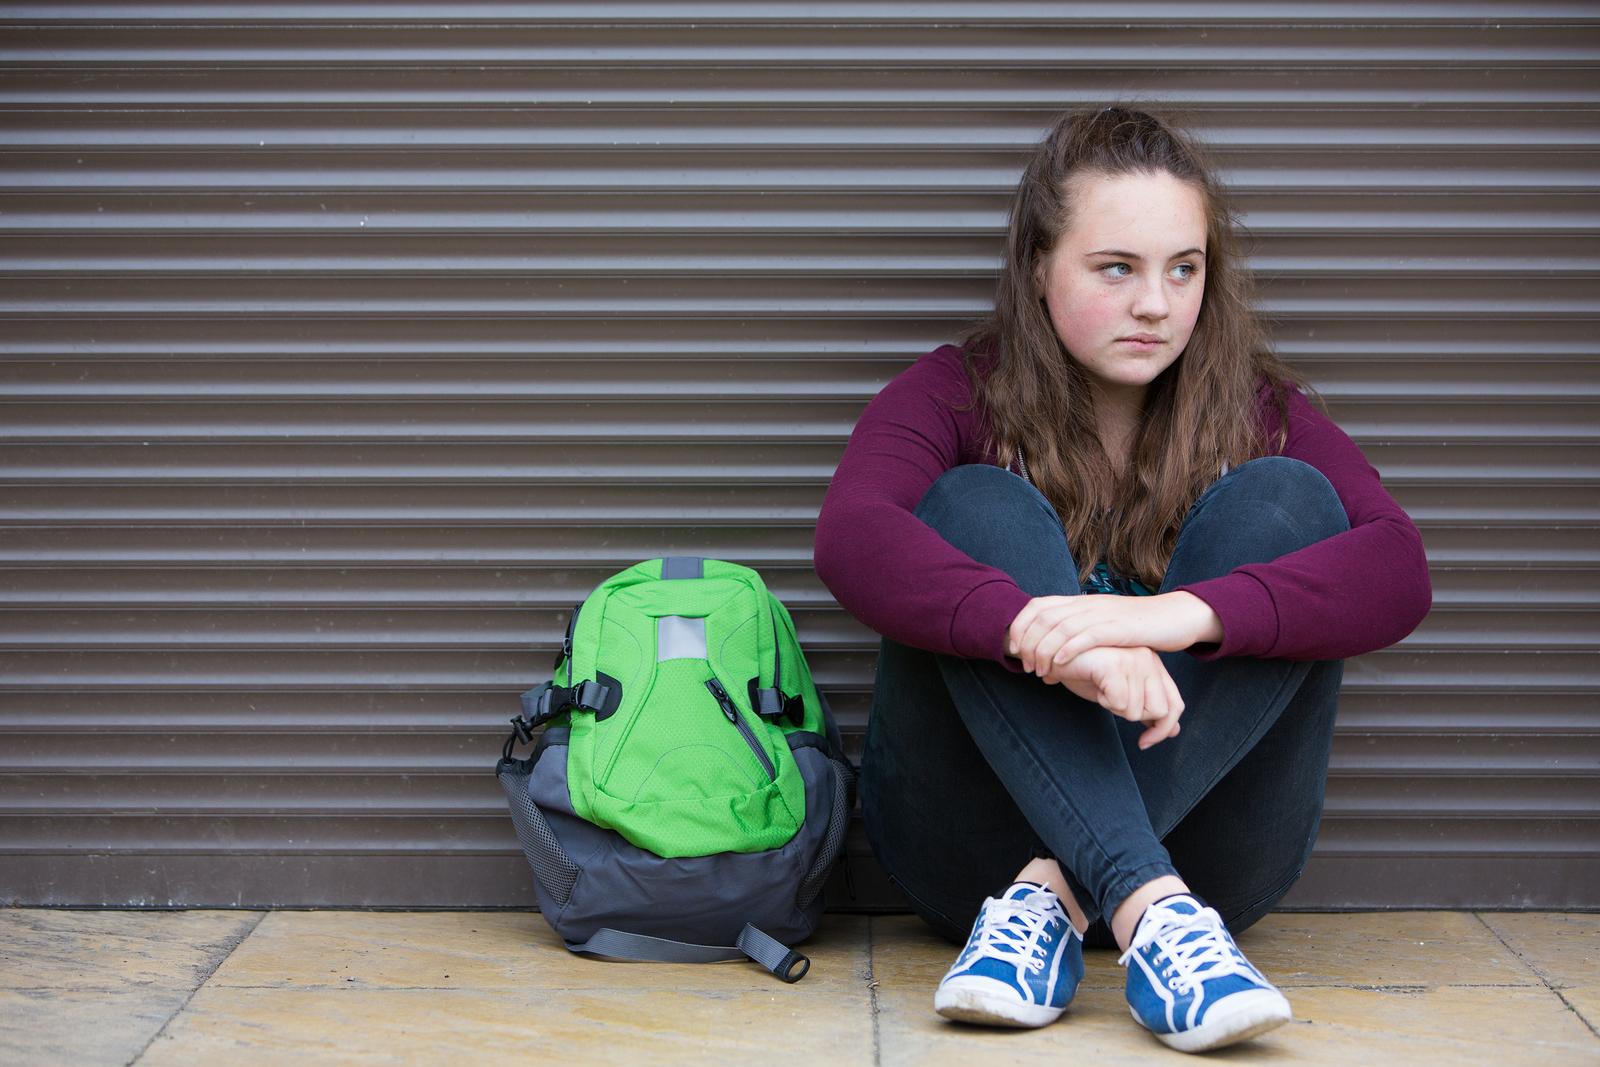 bigstock-Homeless-Teenage-Girl-On-Stree-108022685